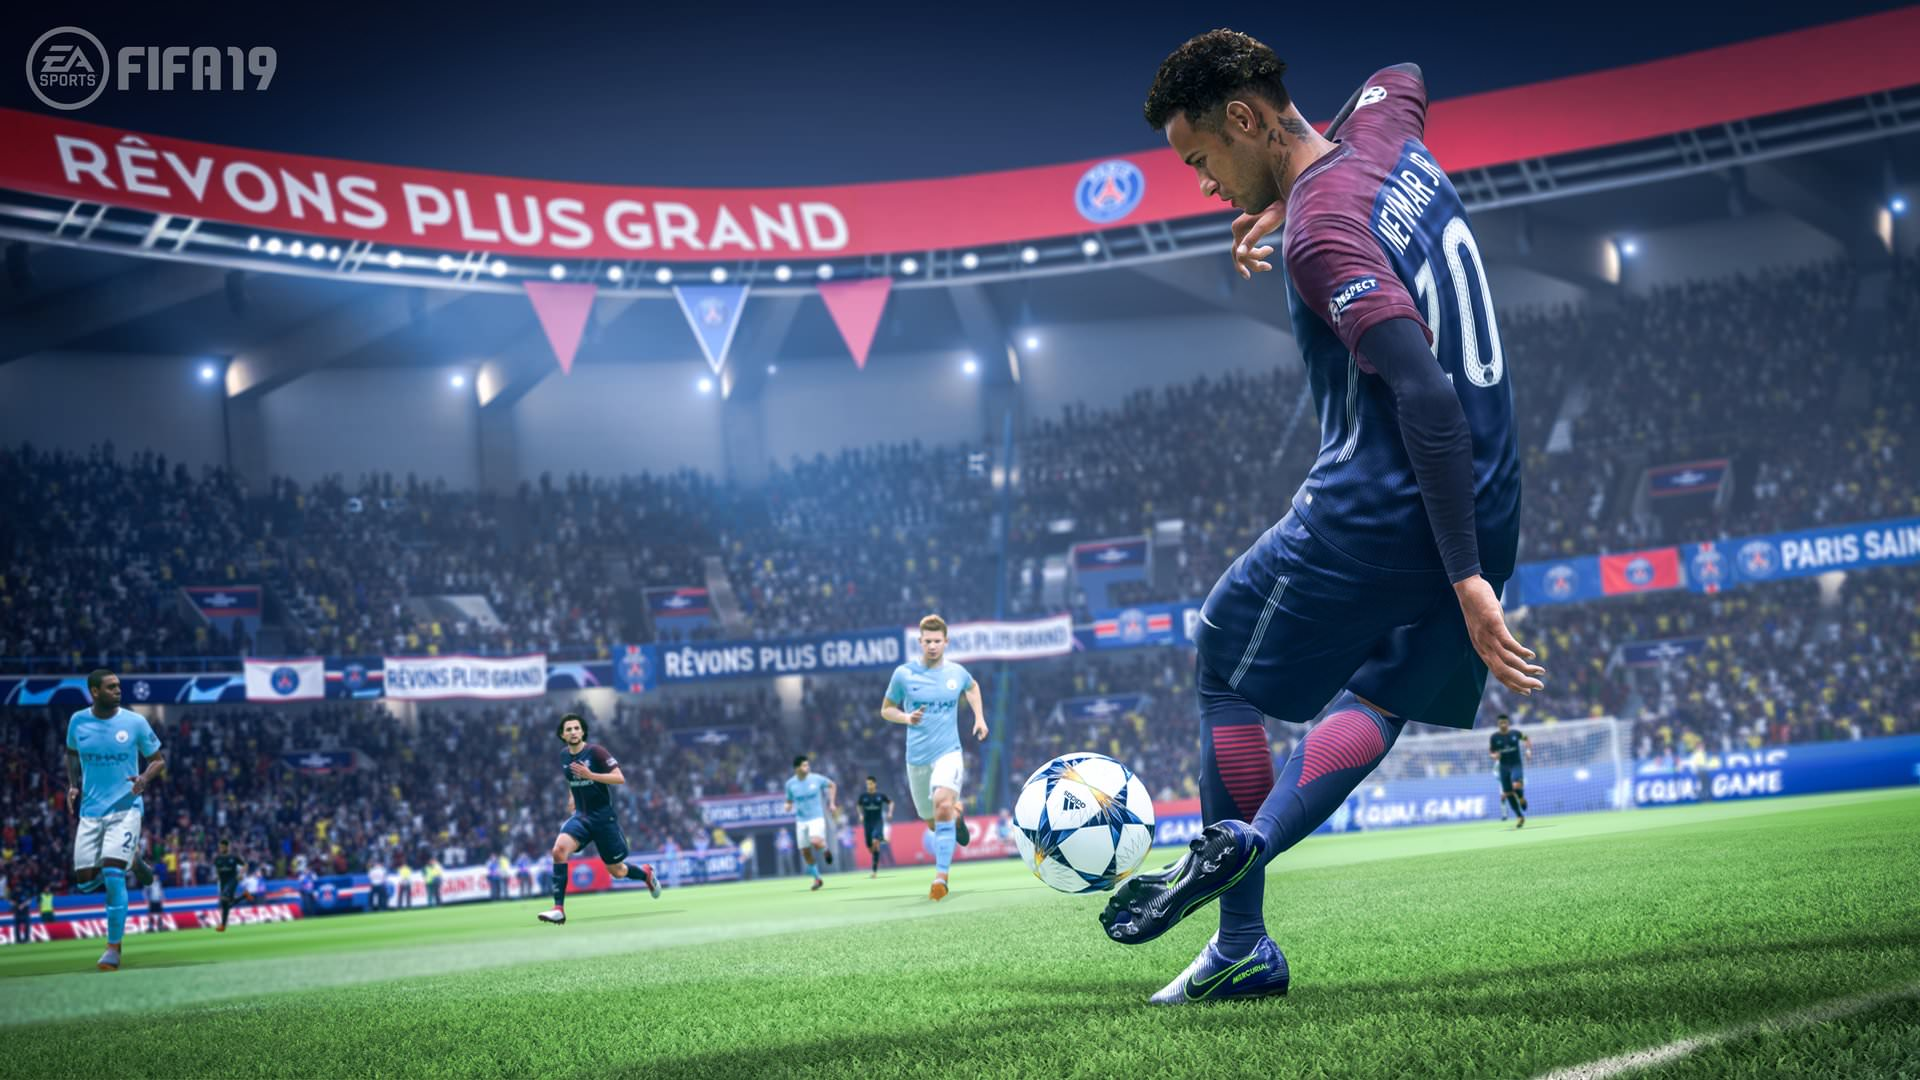 FIFA 19 screenshot Neymar